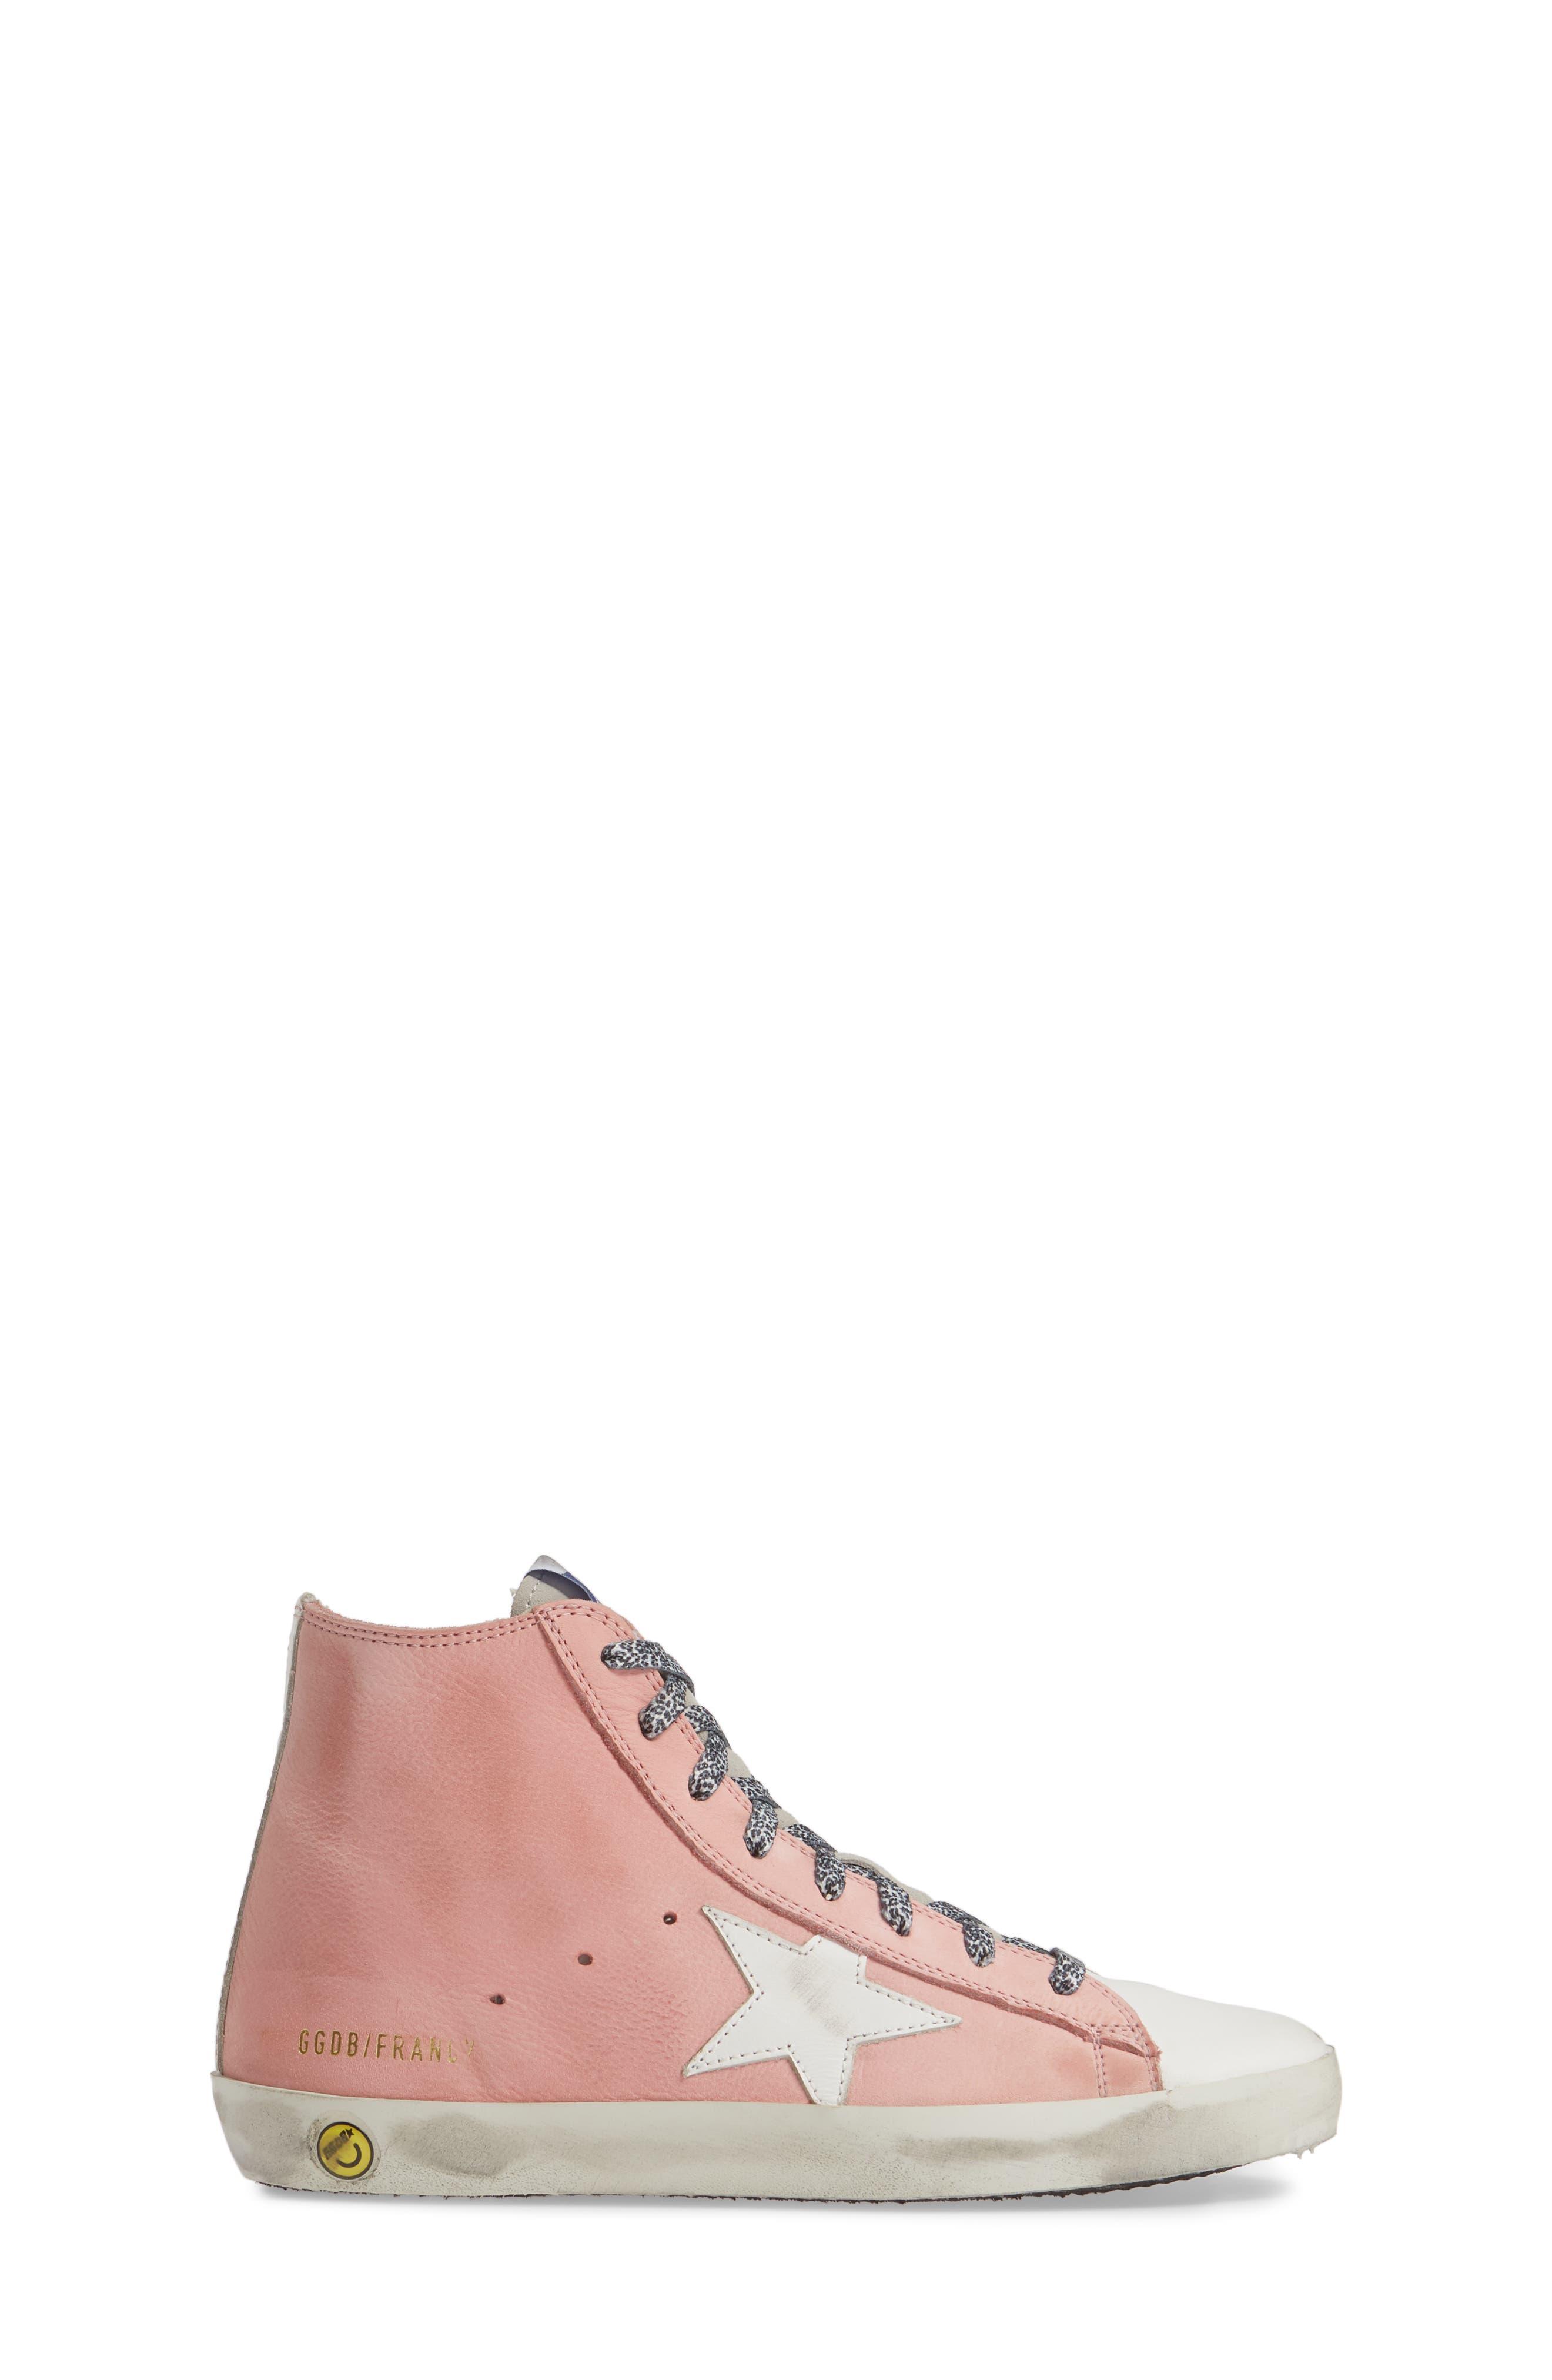 GOLDEN GOOSE, Francy High Top Sneaker, Alternate thumbnail 3, color, PINK PEONY